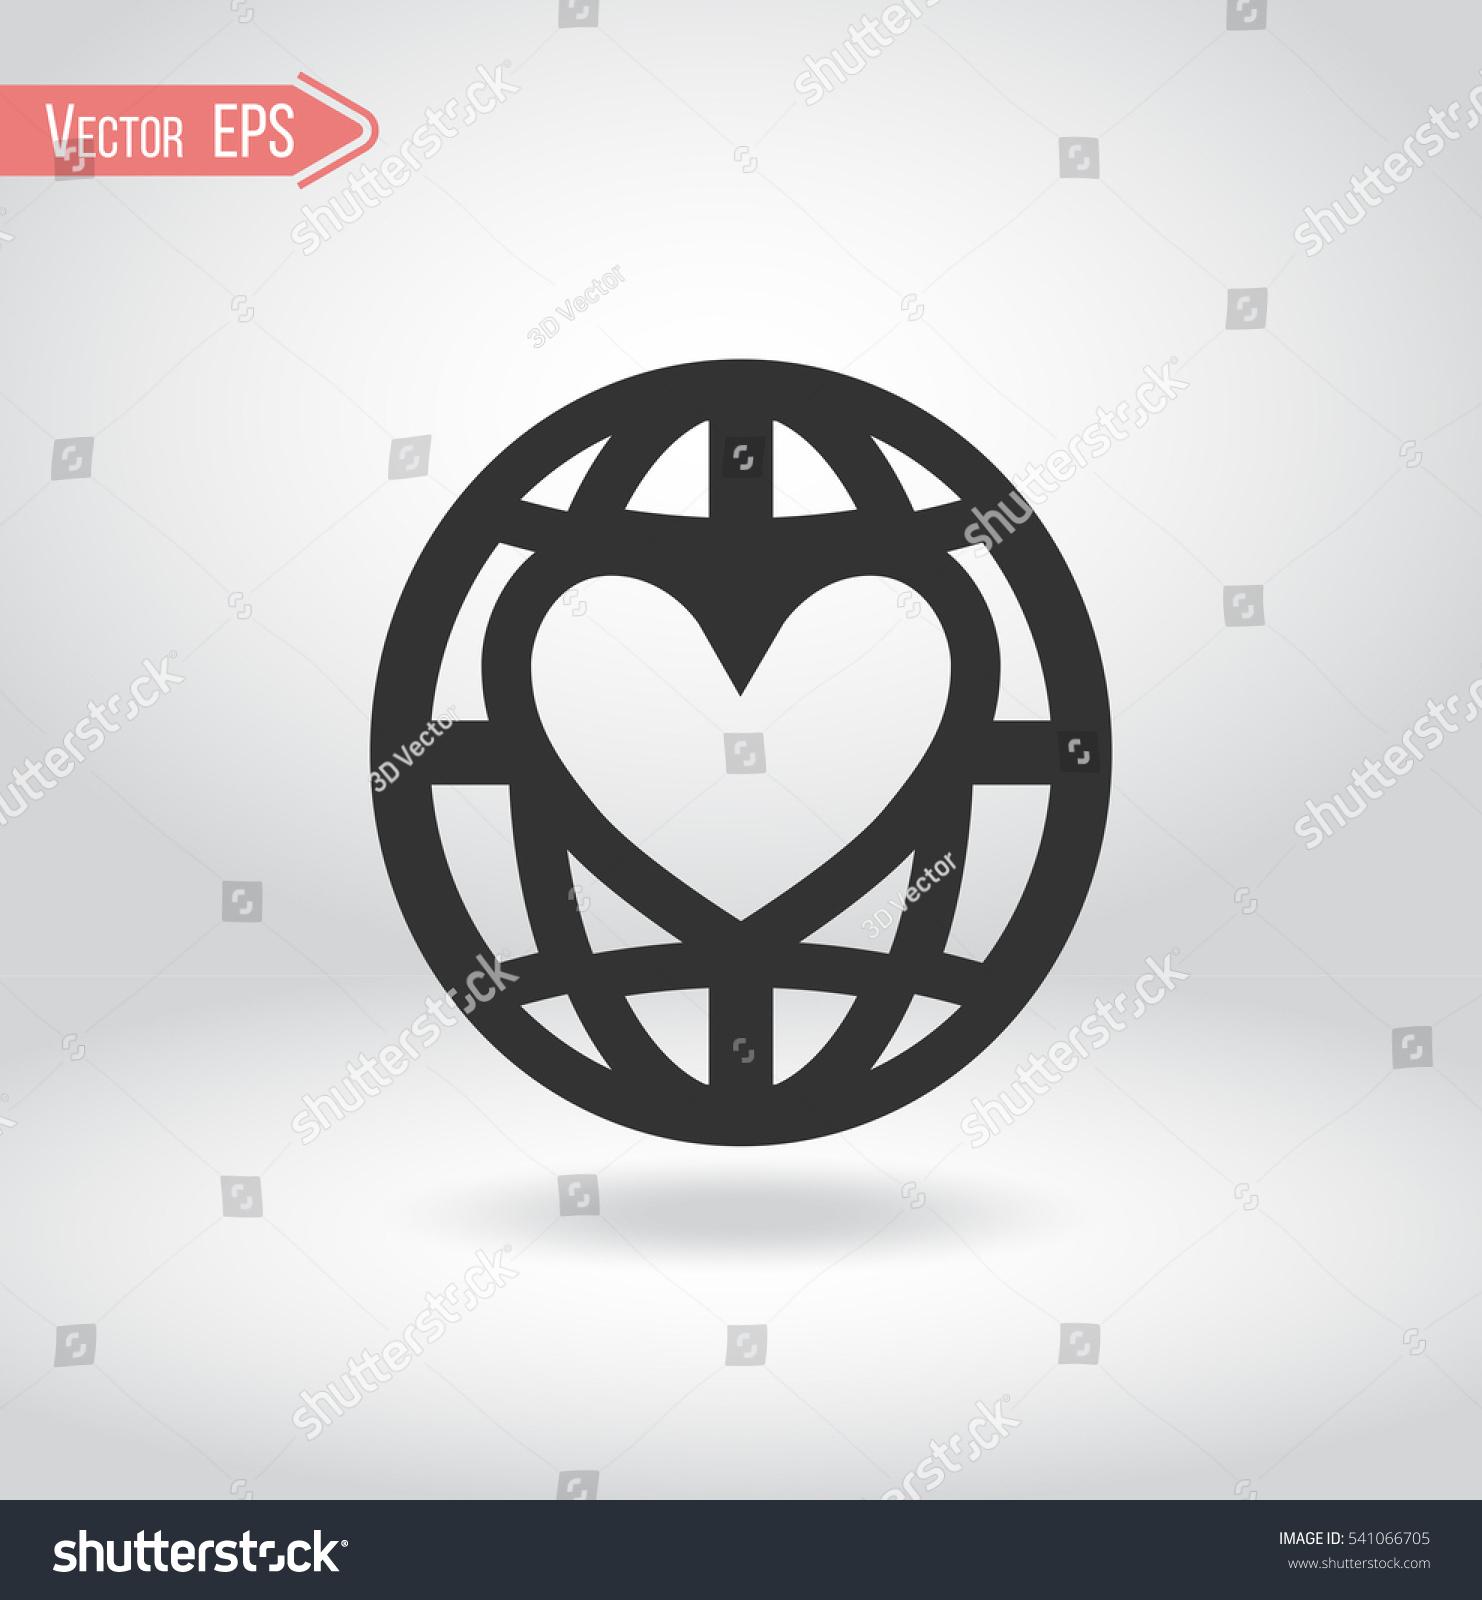 Illustration globe heart logo nonprofit organization stock vector illustration of a globe with heart logo for non profit organization symbol for buycottarizona